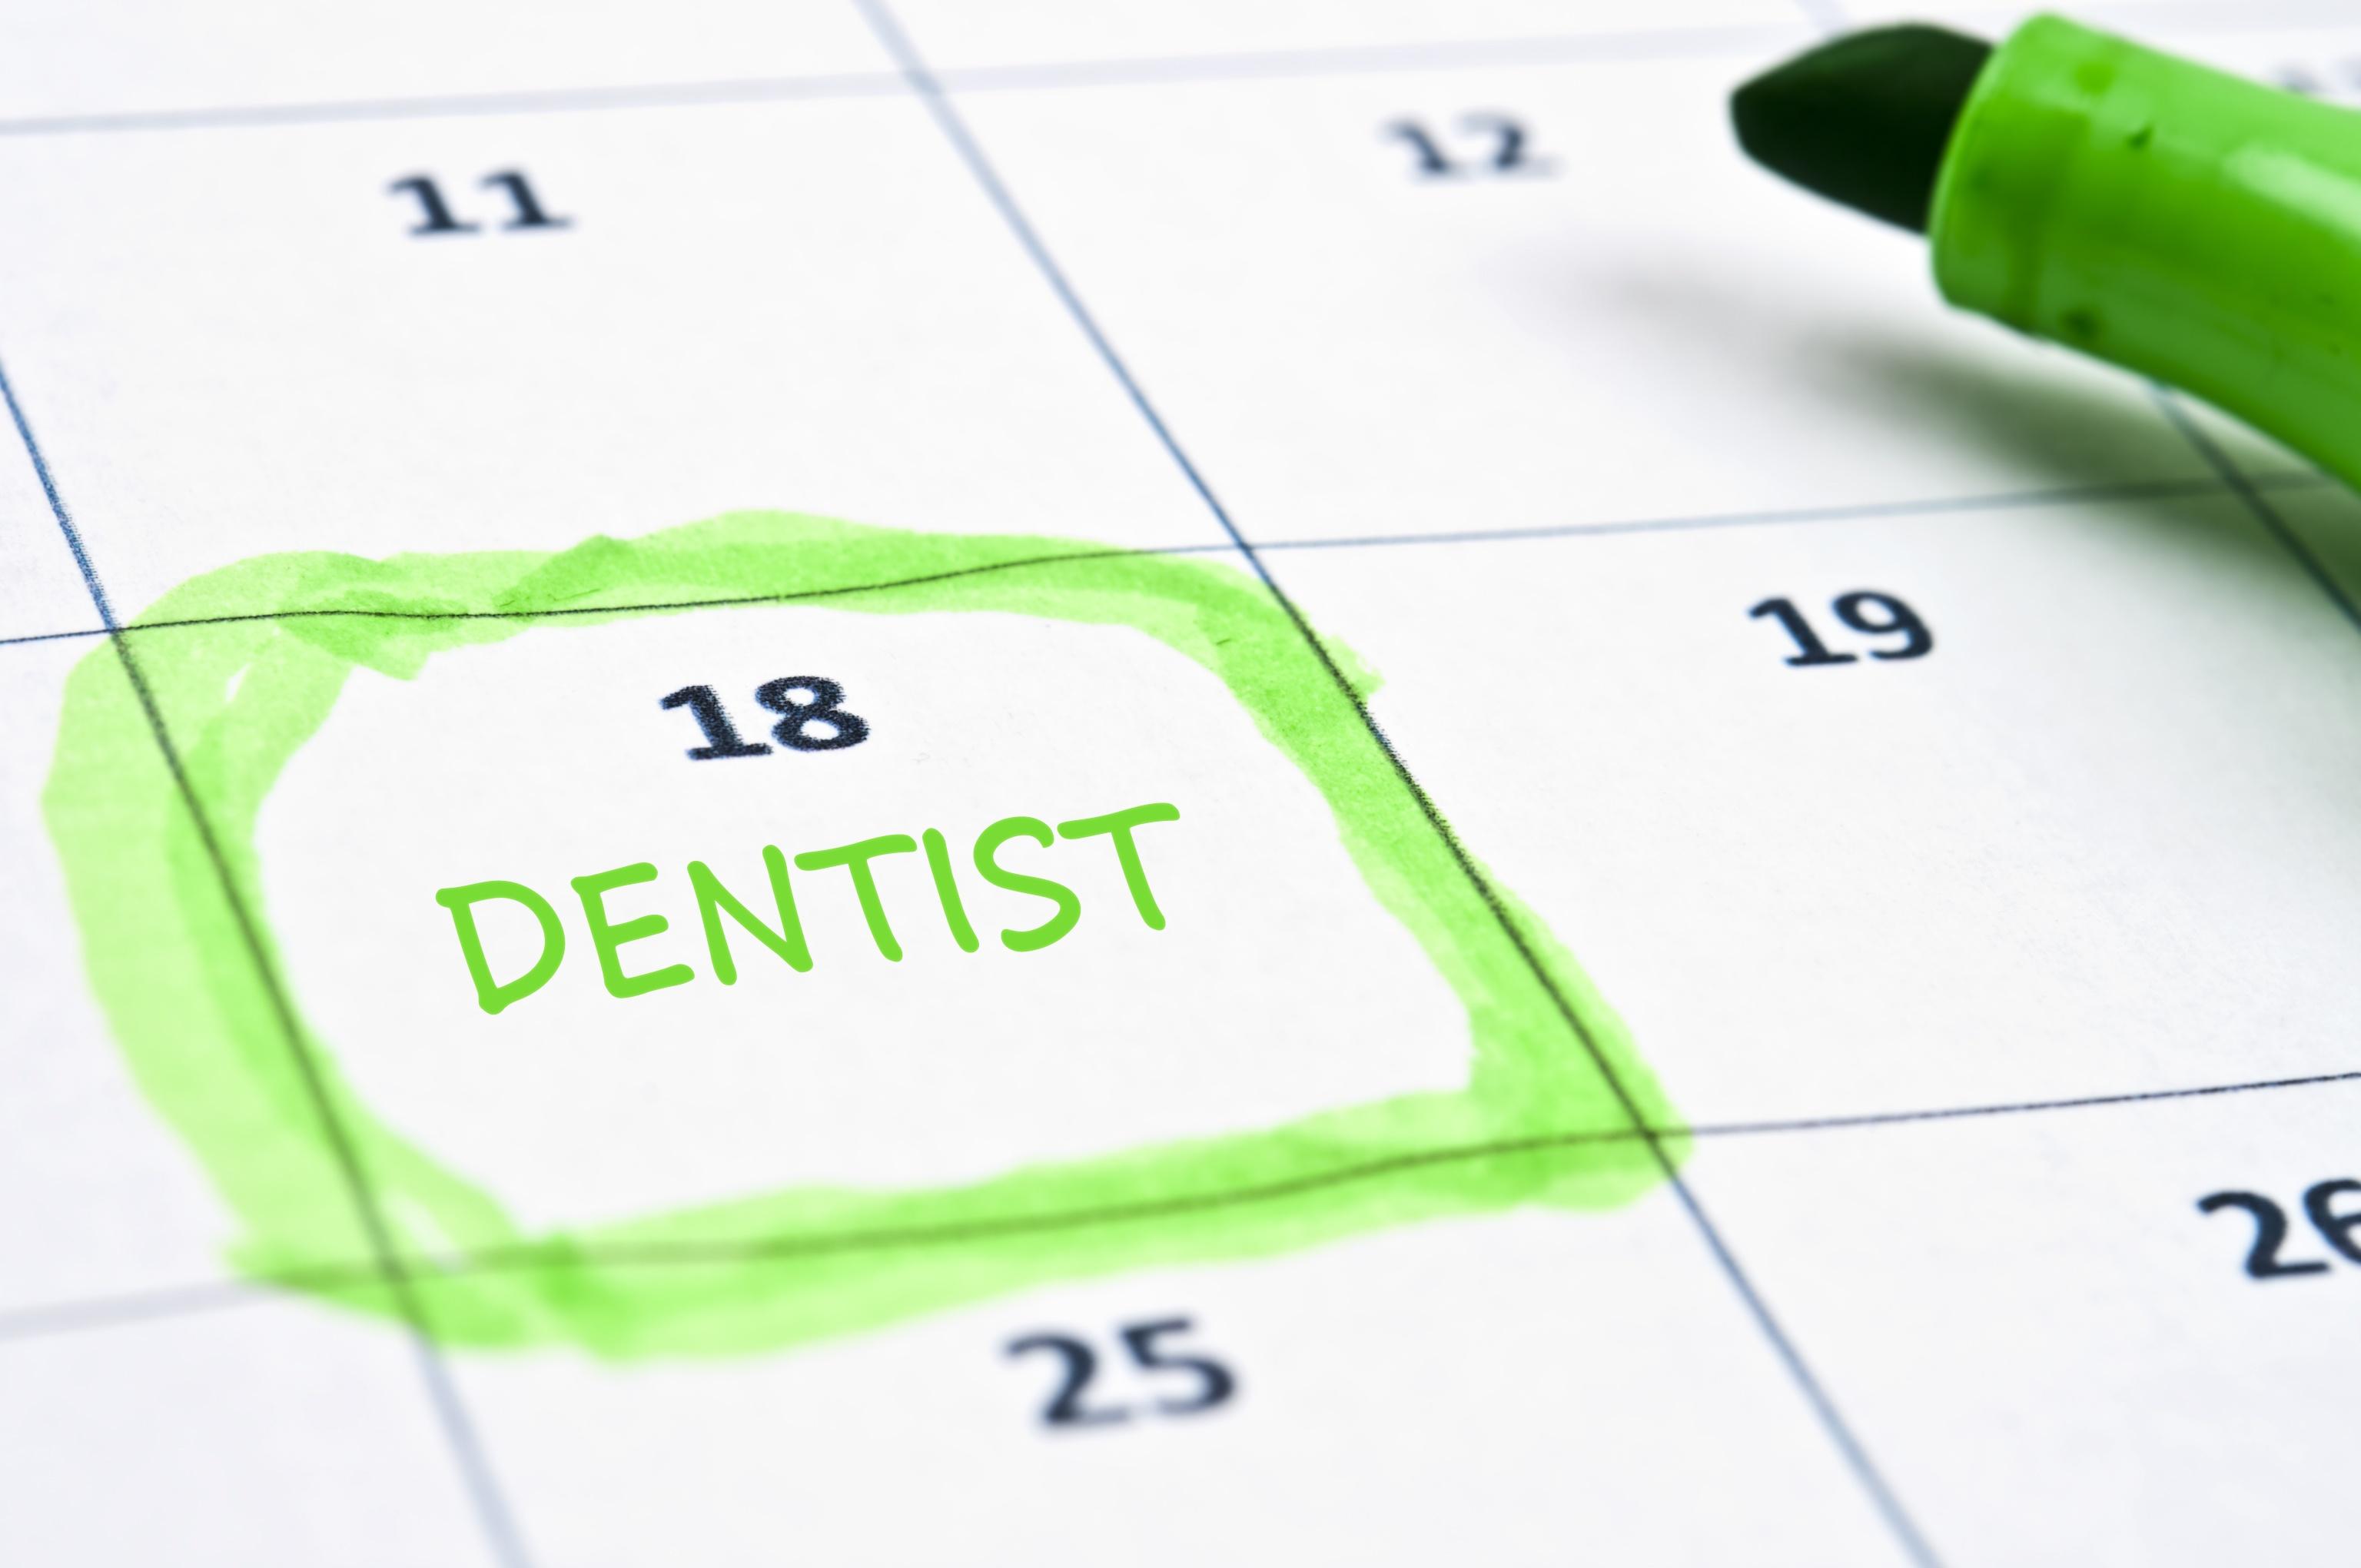 Dentist in Stoughton